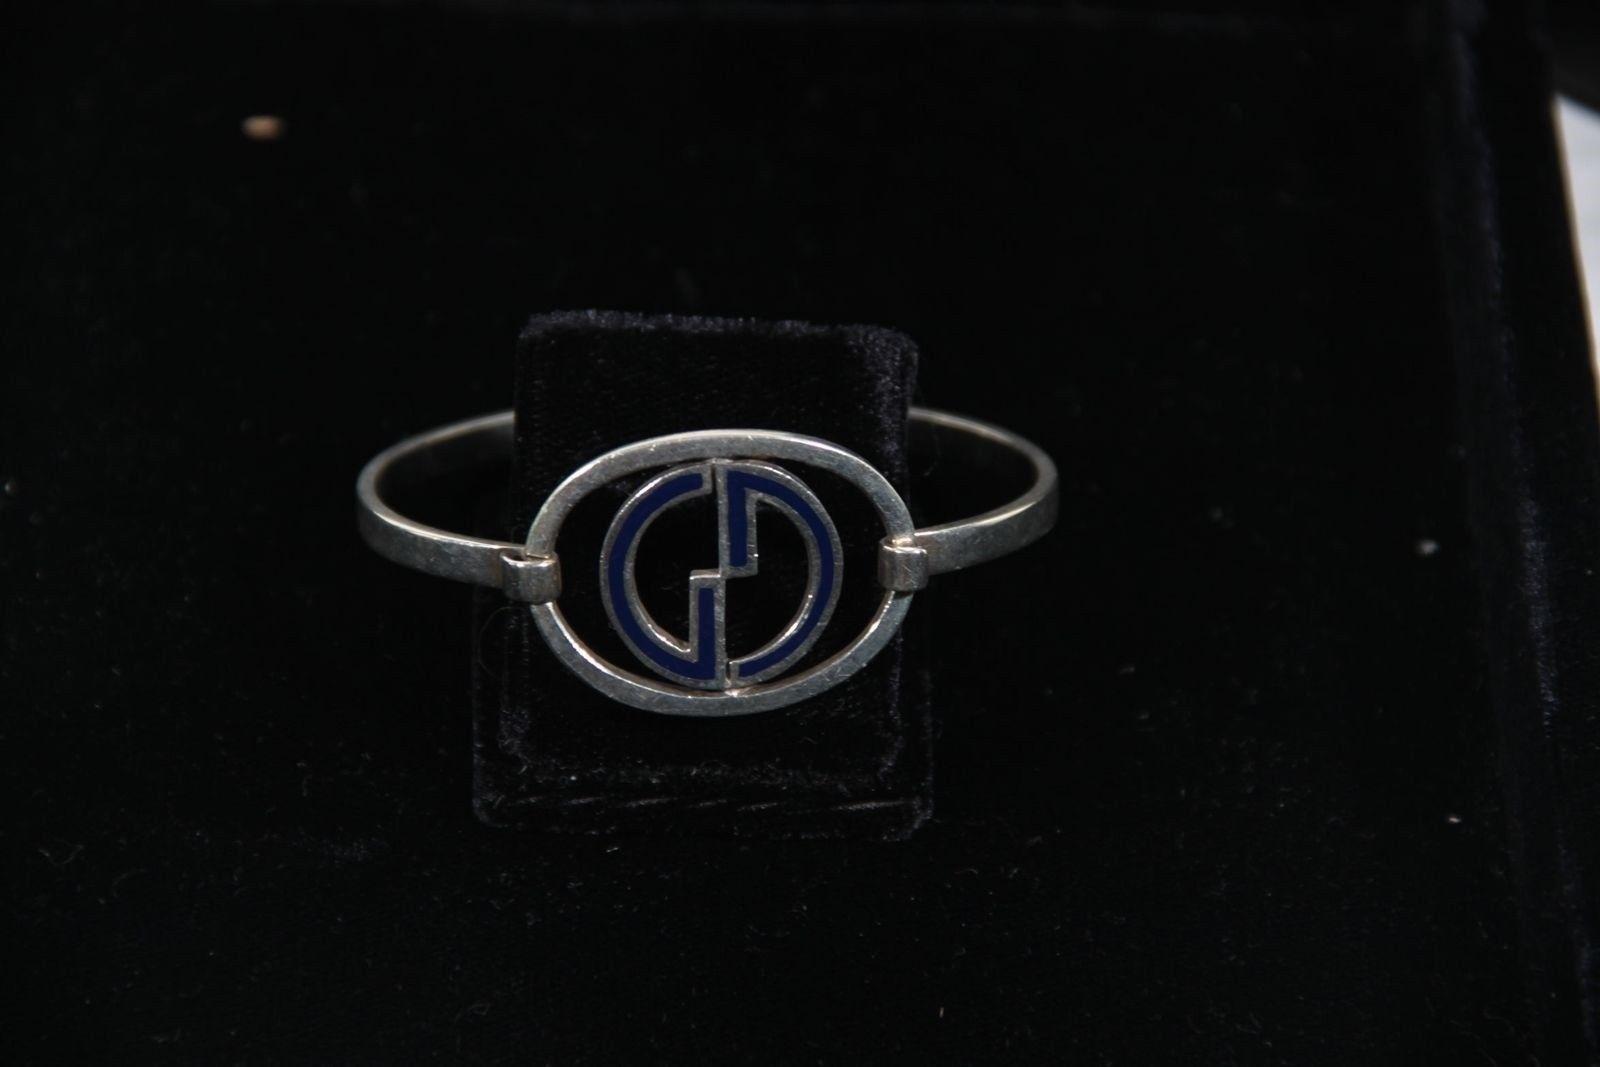 9cea6e195 ... Authentic GUCCI VINTAGE Sterling Silver BANGLE Blue Enamel GG LOGO  Bracelet ...